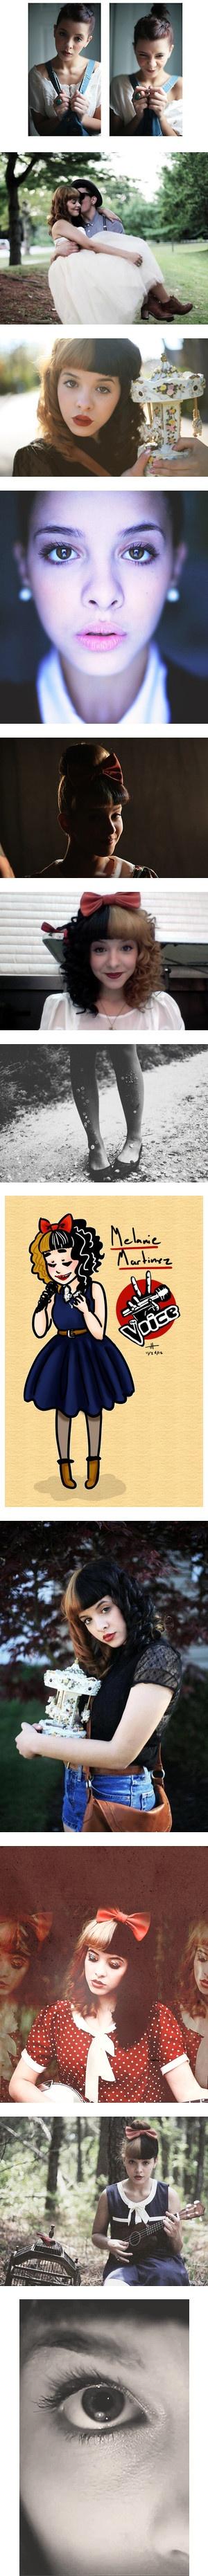 """Melanie Martinez"" by neearememberssunday ❤ liked on Polyvore"